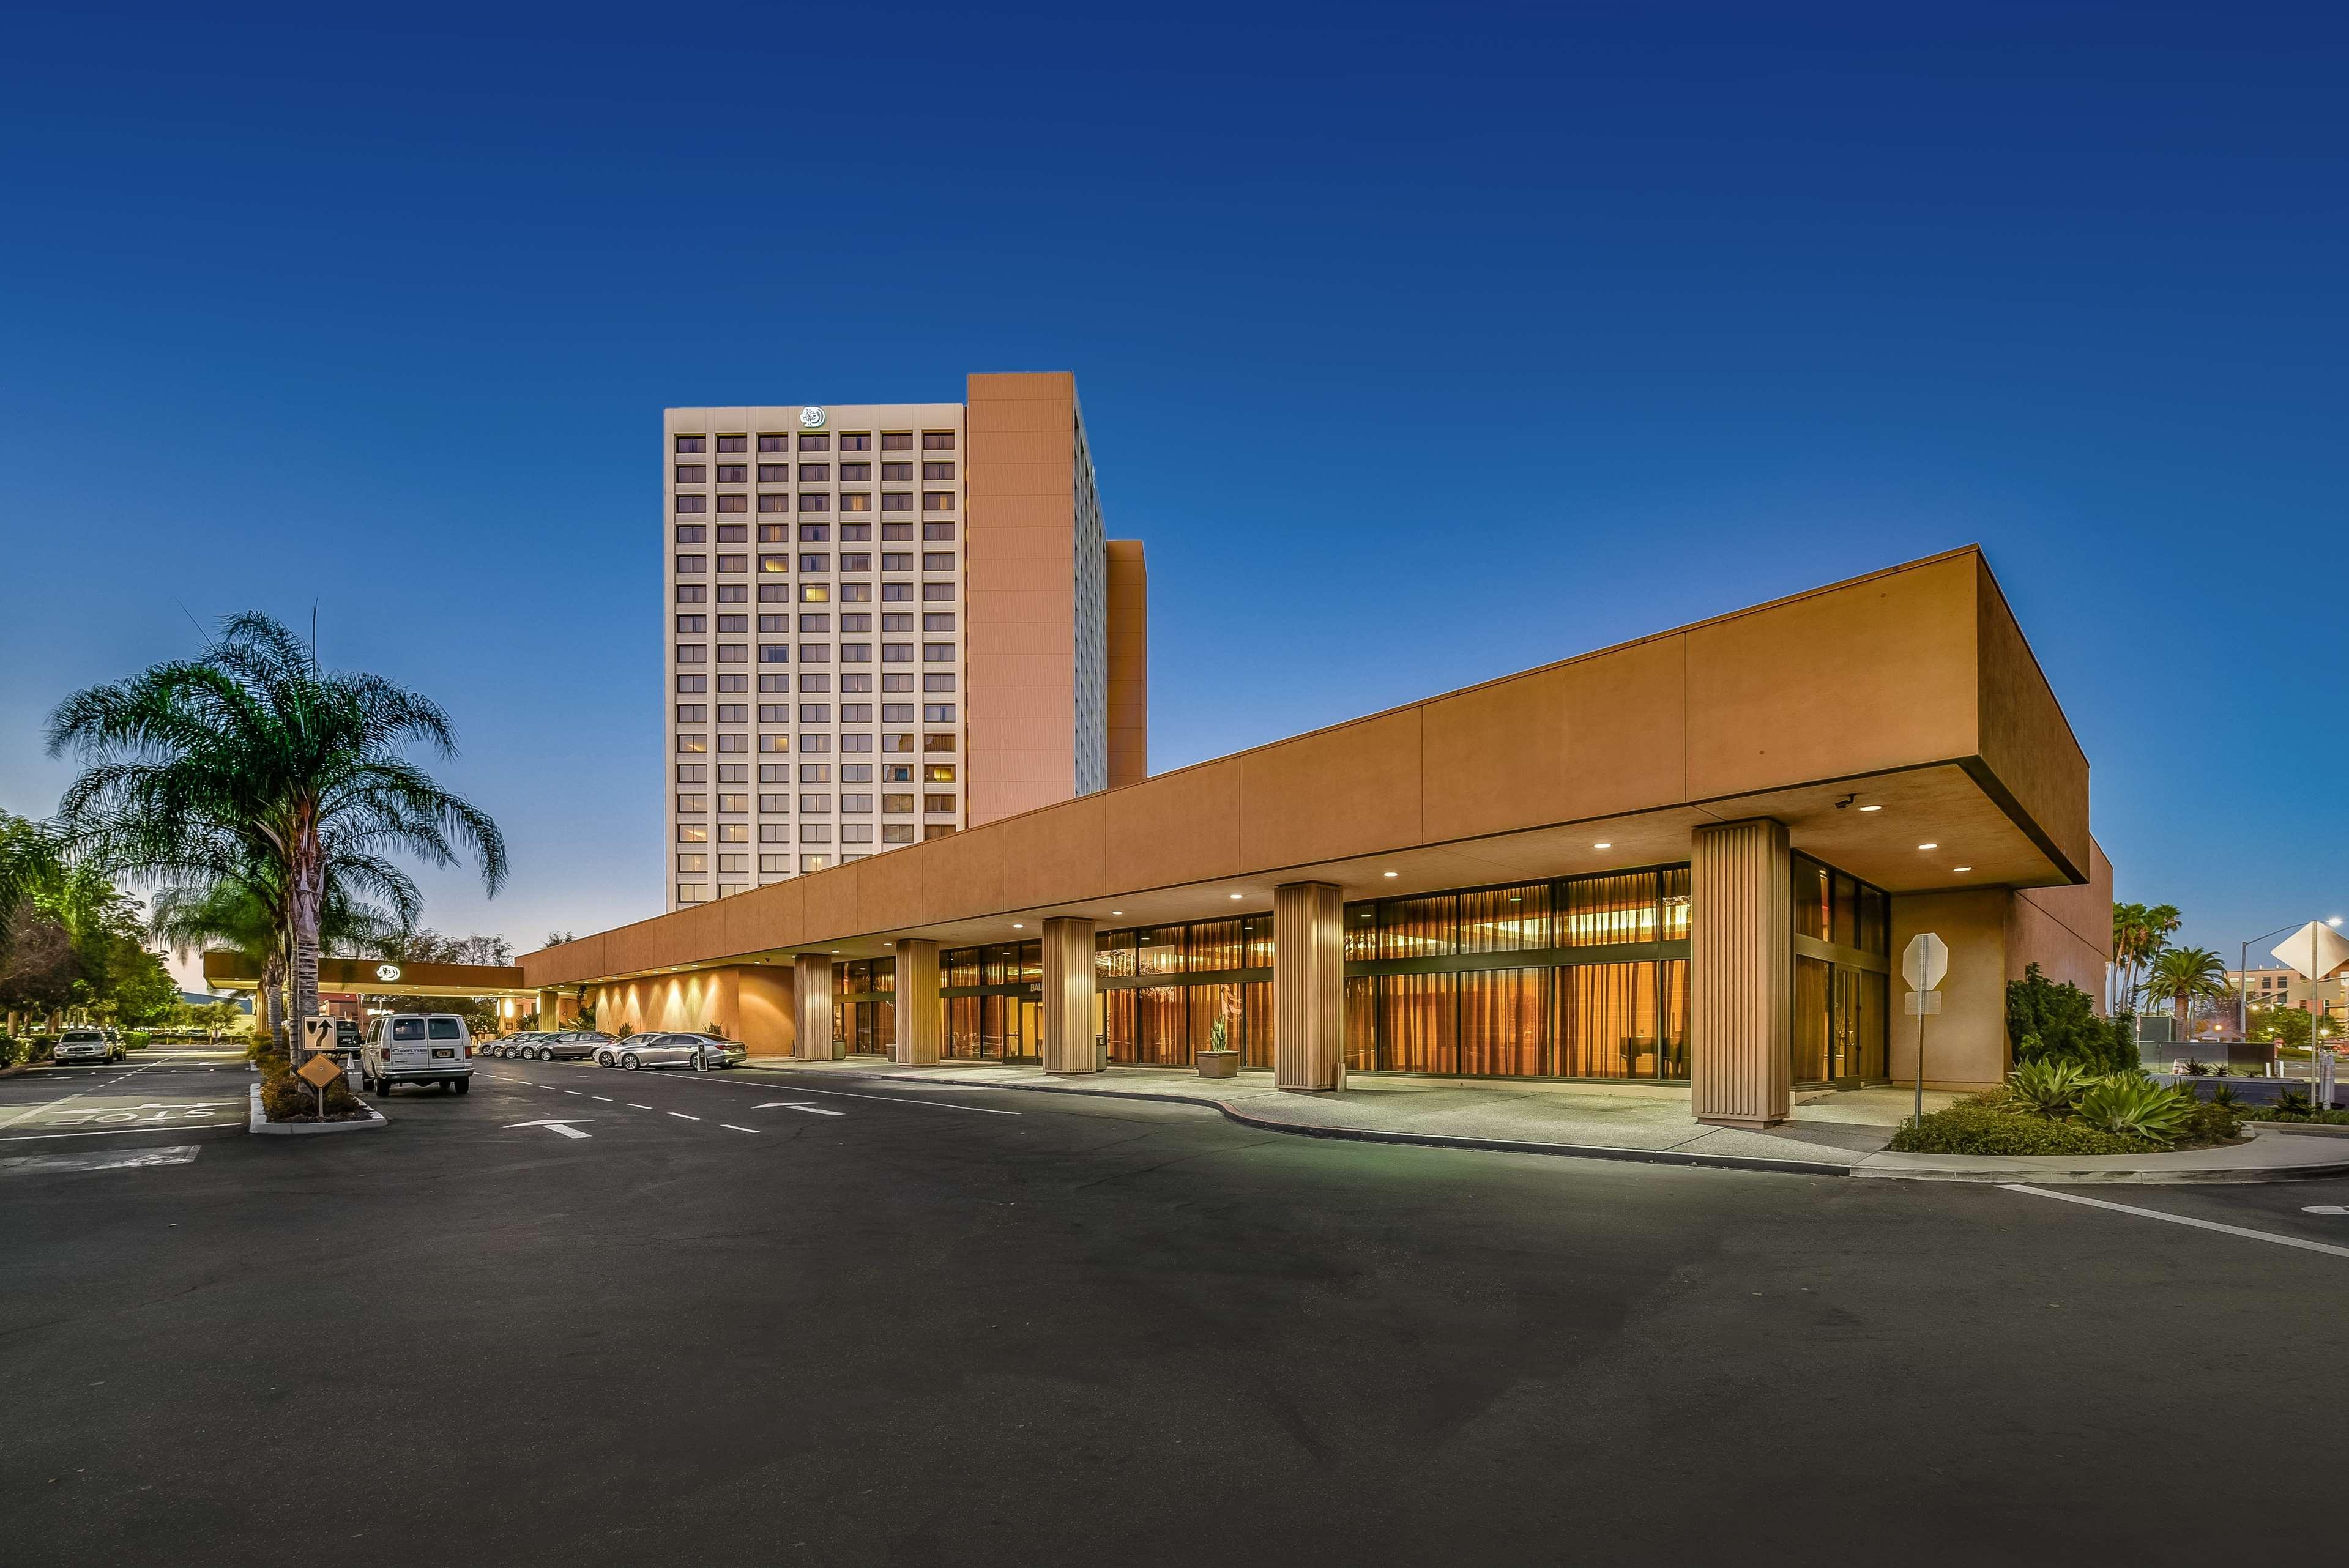 DoubleTree by Hilton Hotel Anaheim - Orange County image 1